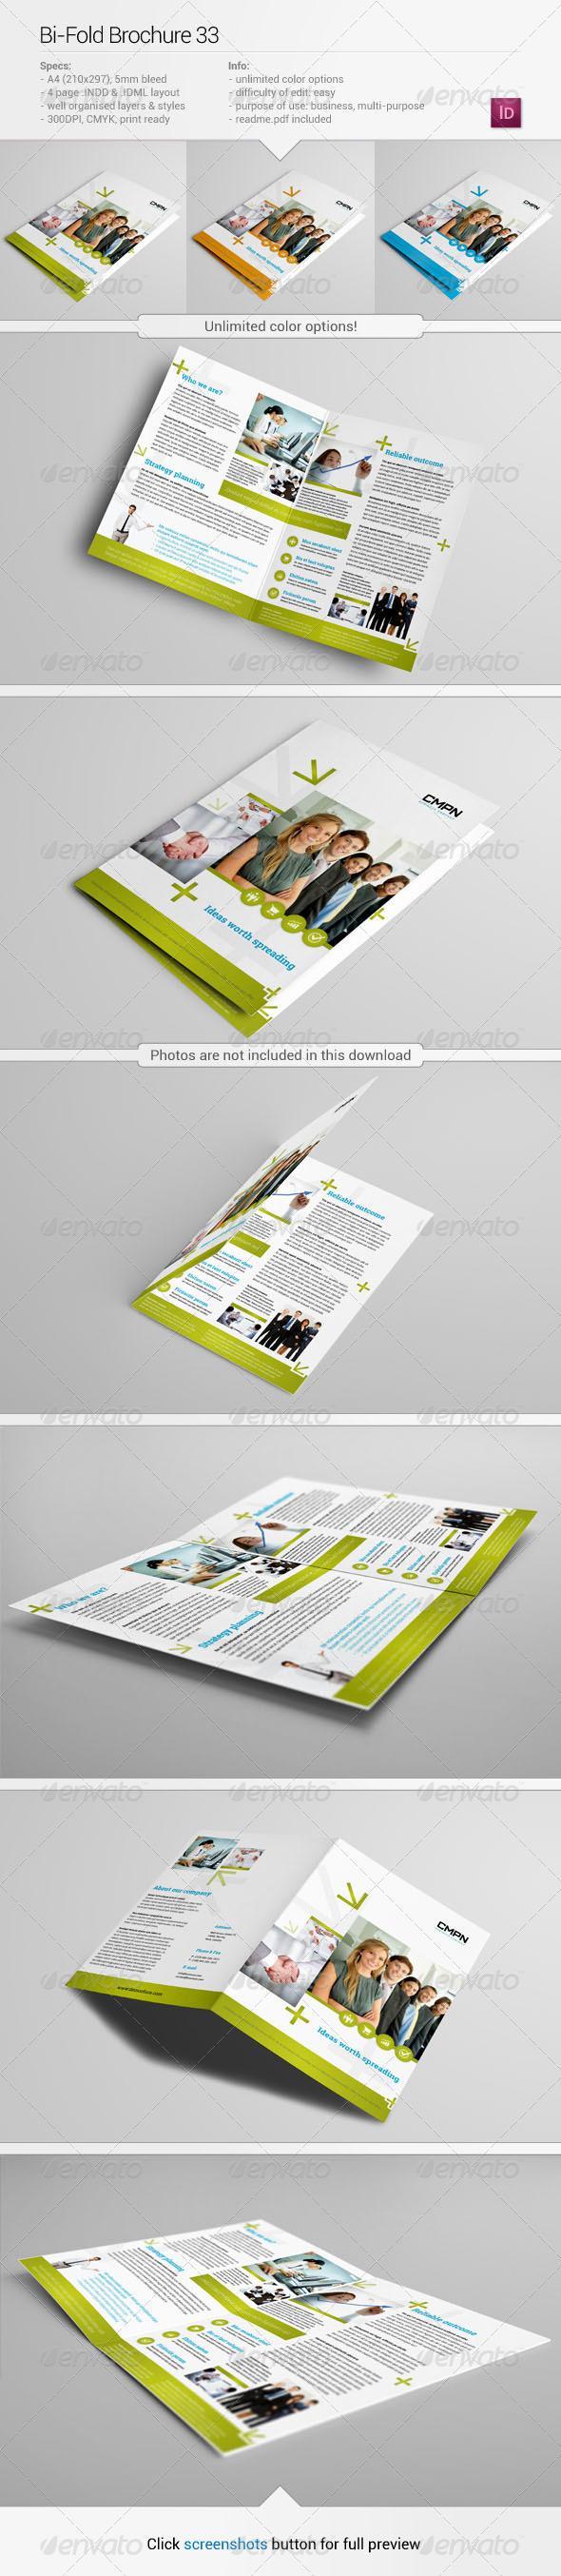 Bi-Fold Brochure 33 - Corporate Brochures